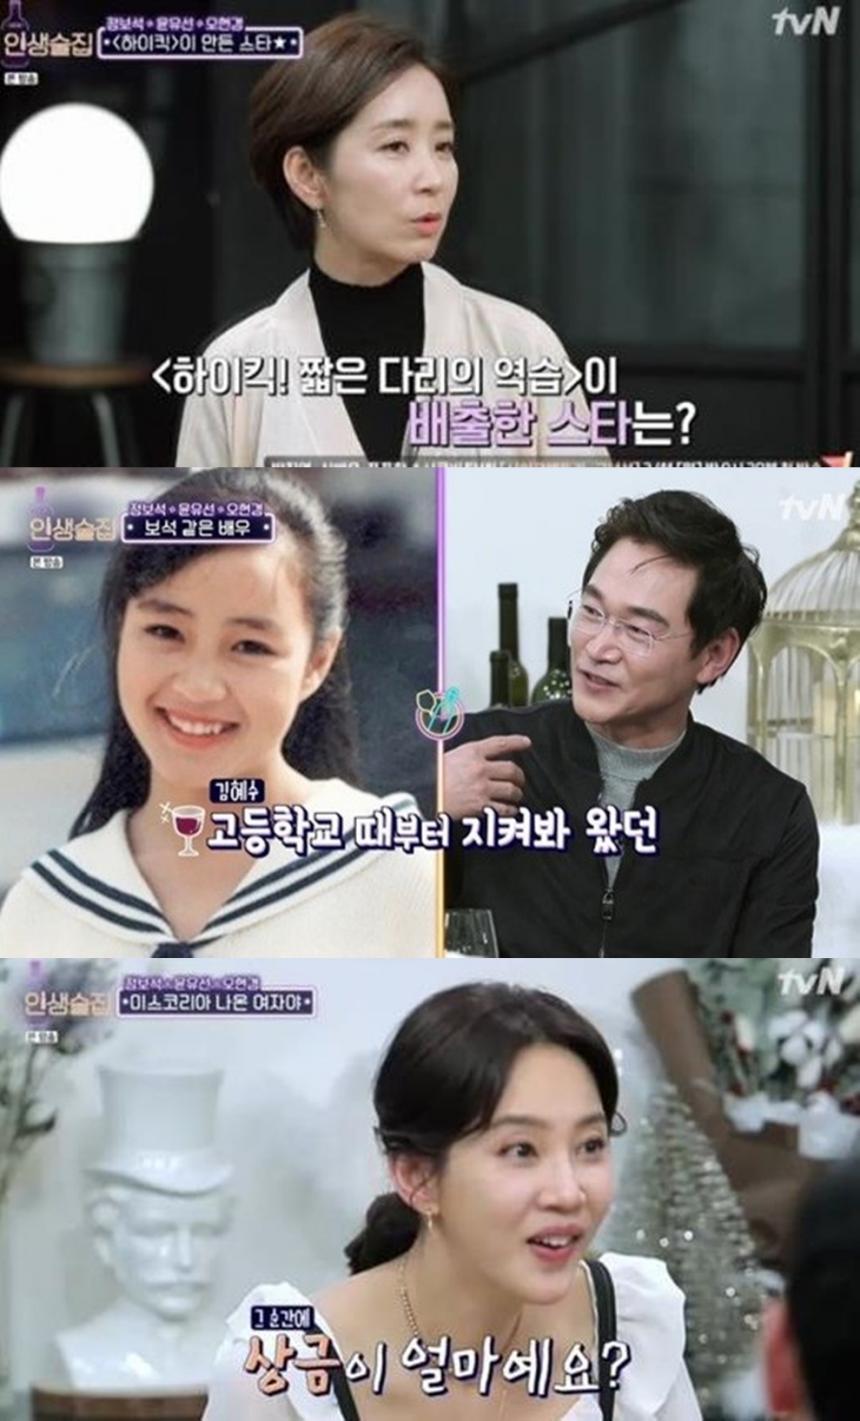 tvN 'NEW 인생술집' 방송 캡처